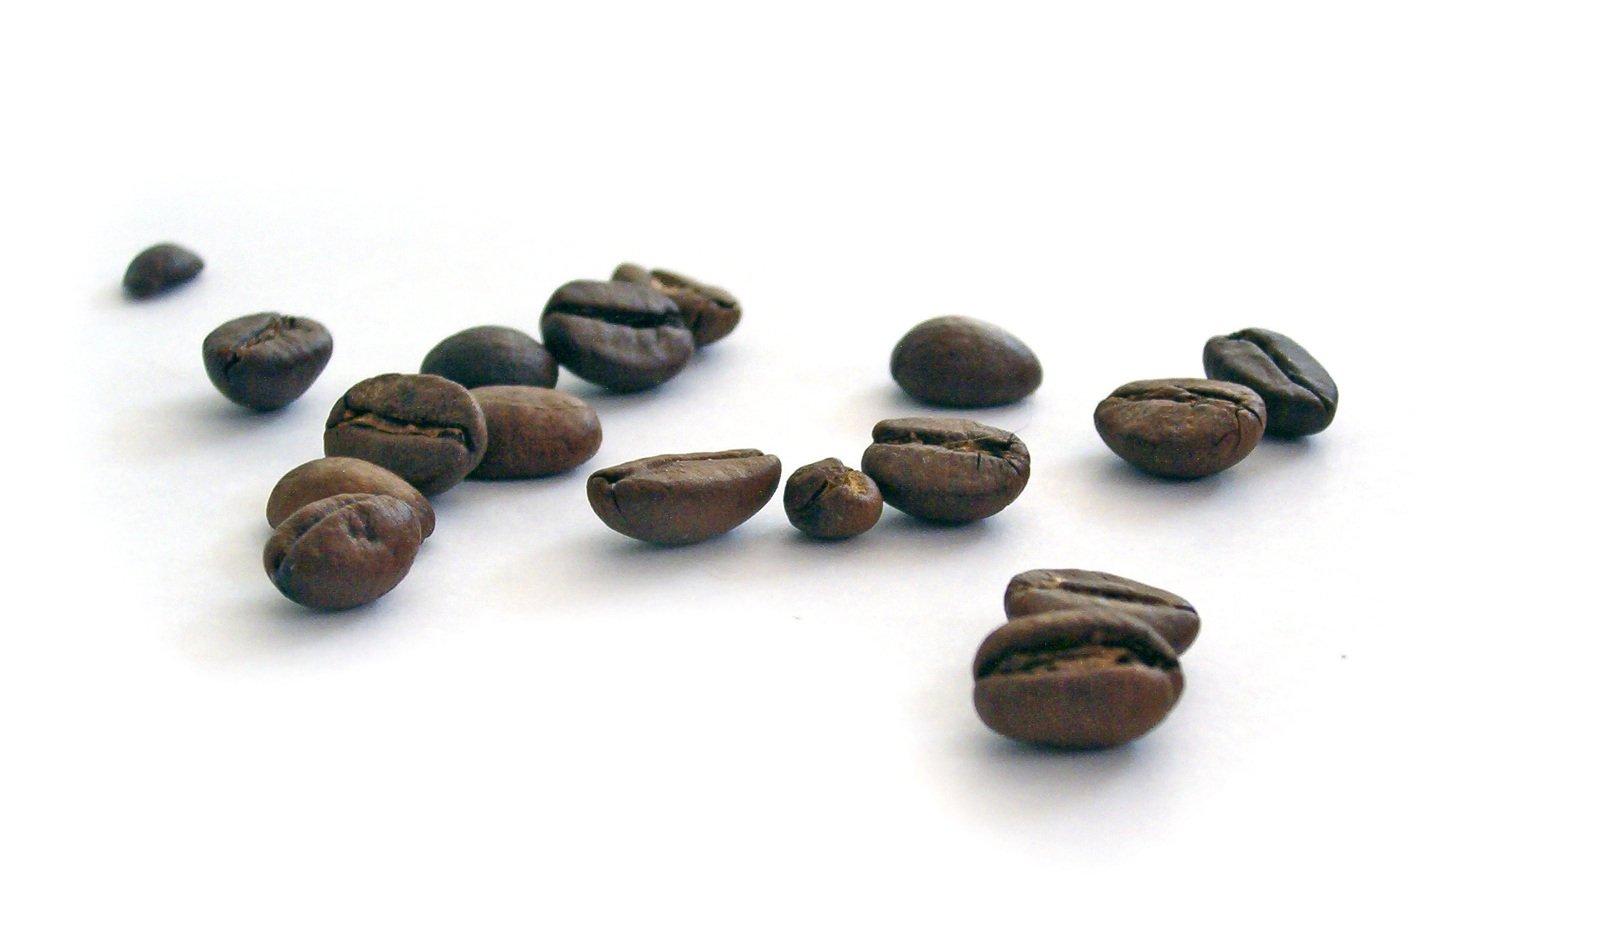 coffee grain 3 photo files 1329675. Black Bedroom Furniture Sets. Home Design Ideas